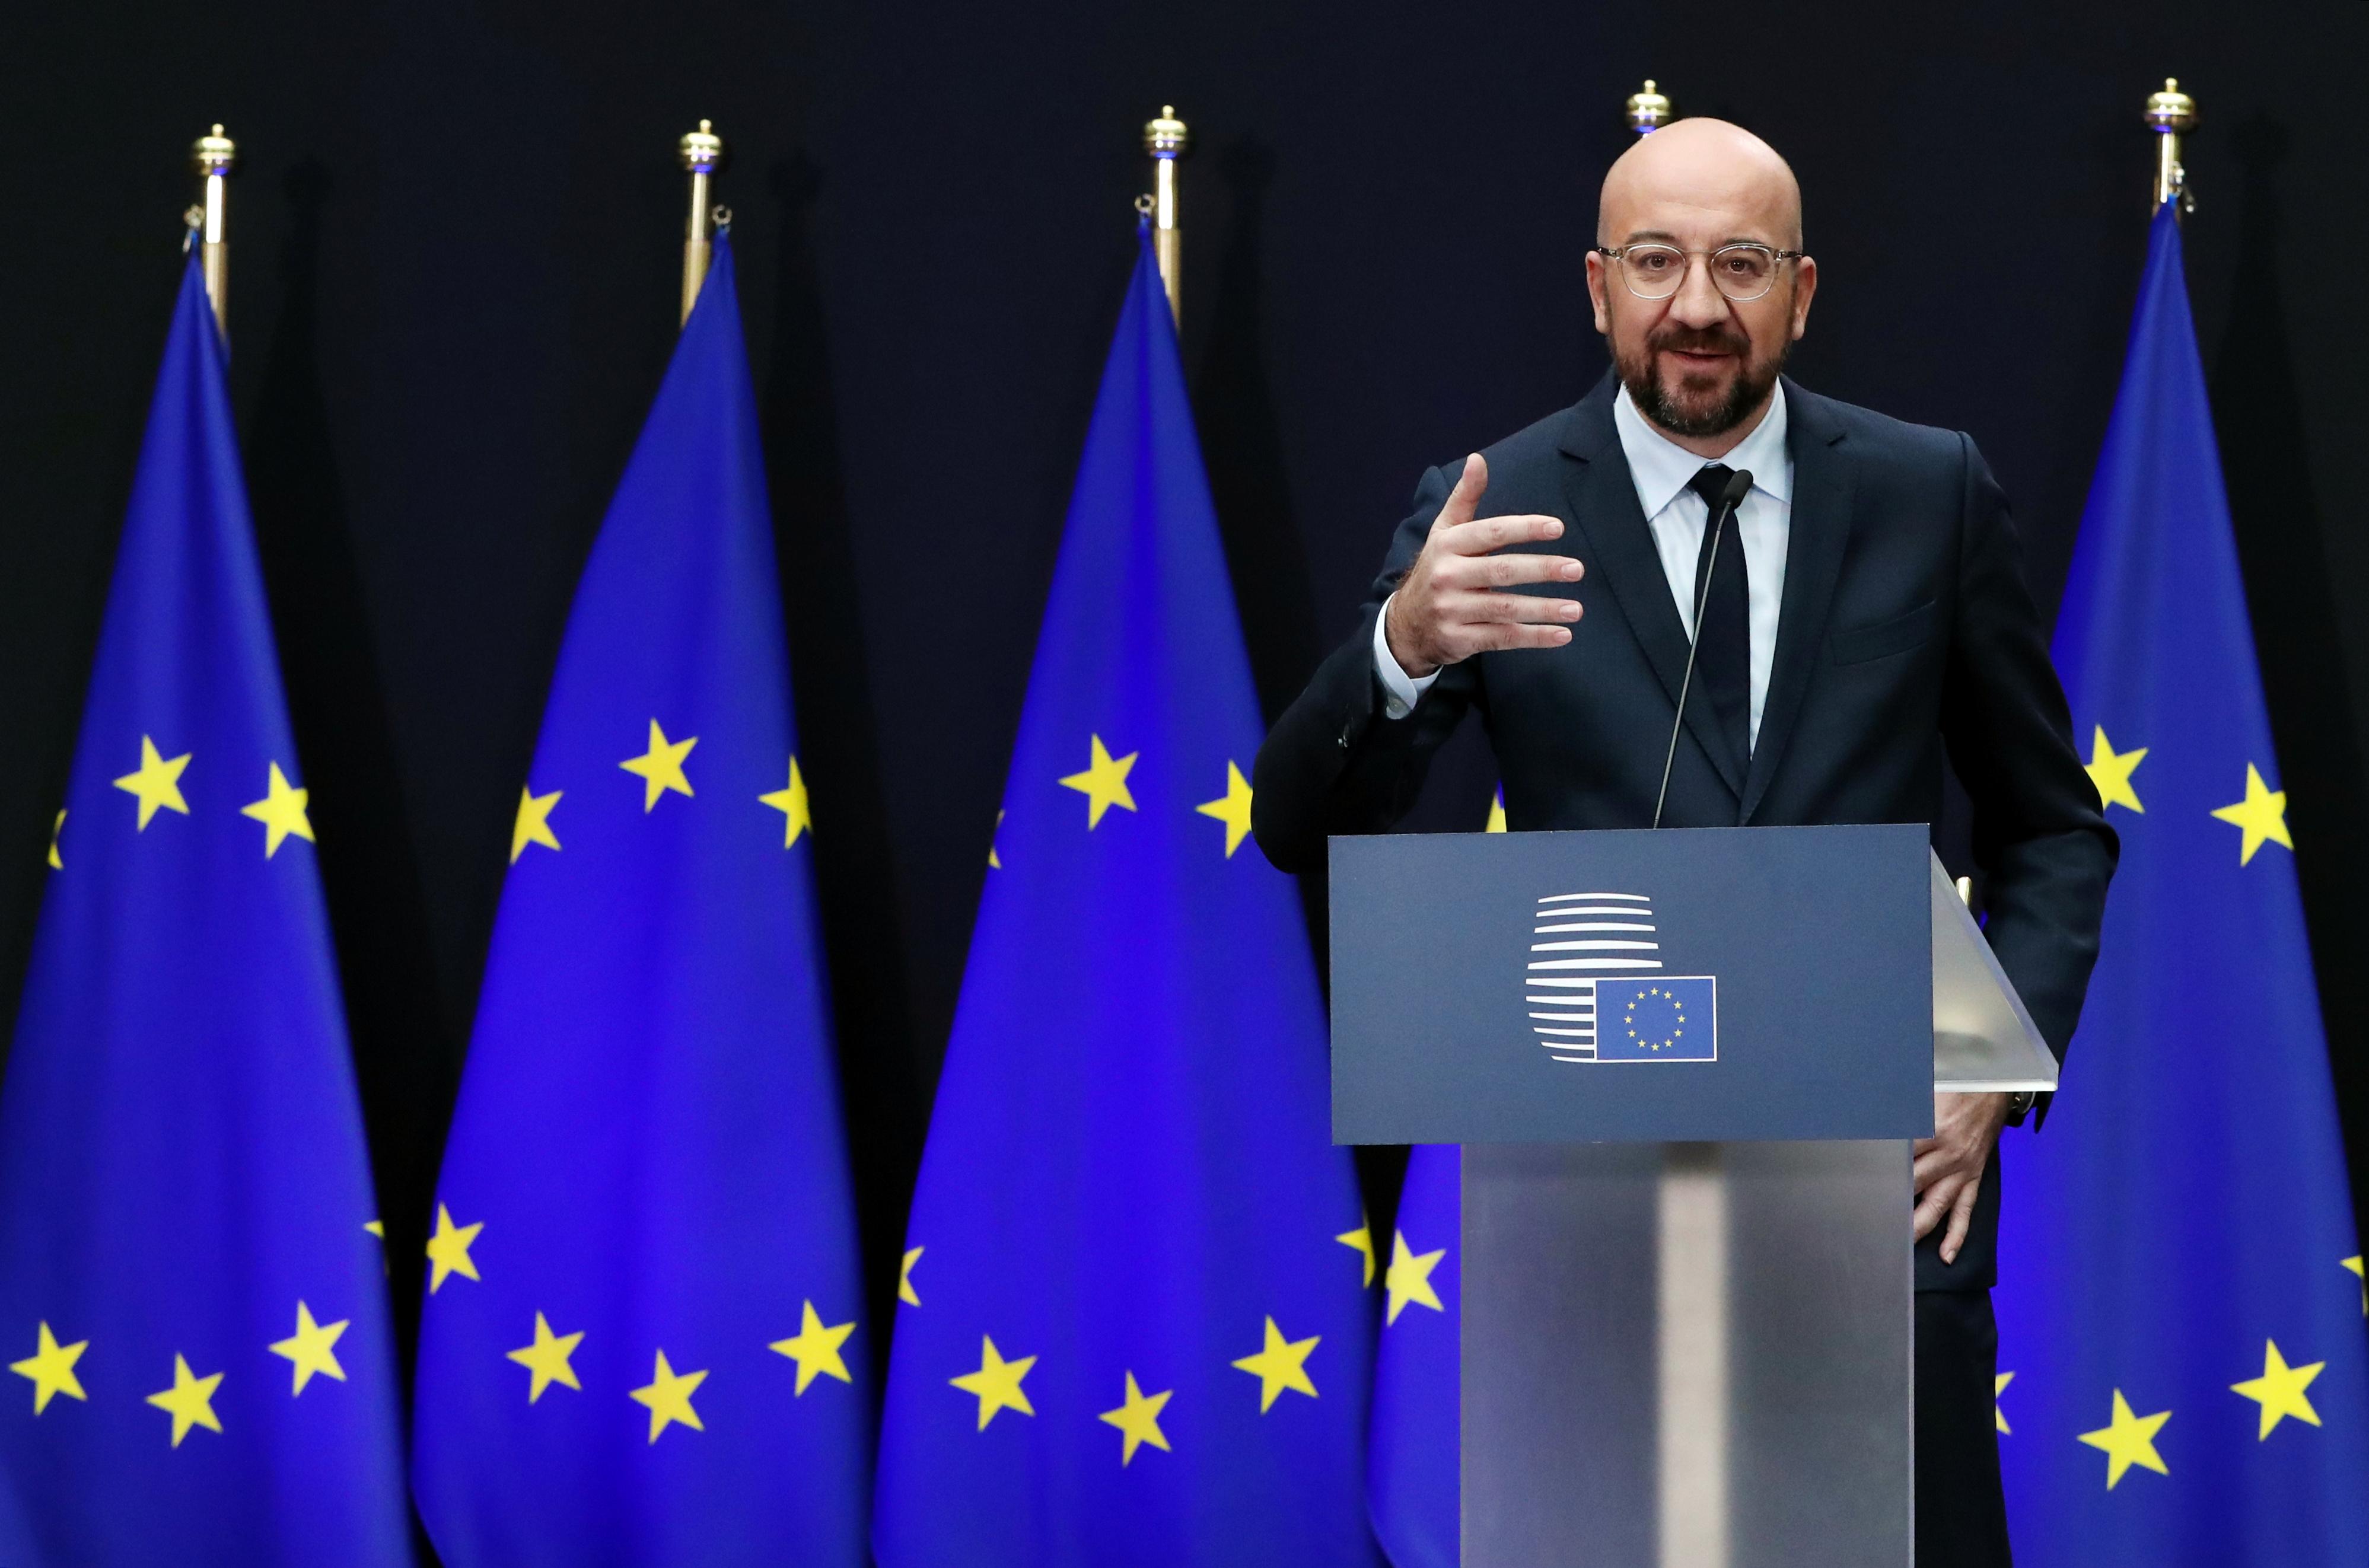 Brexit, Σαρλ Μισέλ: ''Η ΕΕ είναι έτοιμη για συμφωνία, όχι όμως με οποιοδήποτε τίμημα''